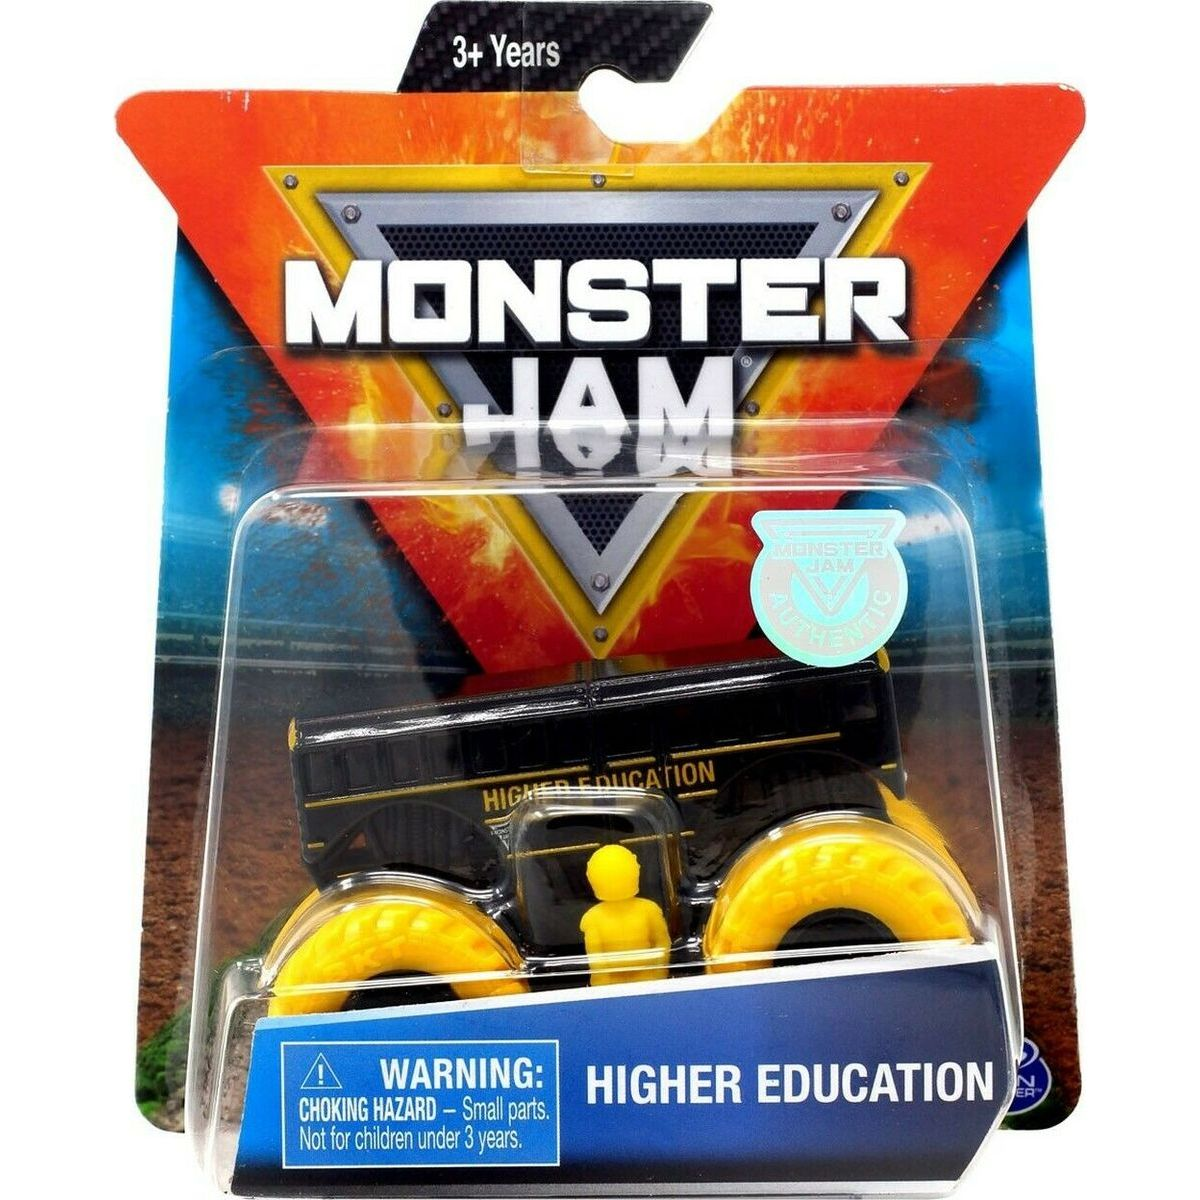 Monster Jam Sběratelská Die-Cast auta 1:64 Higher Education